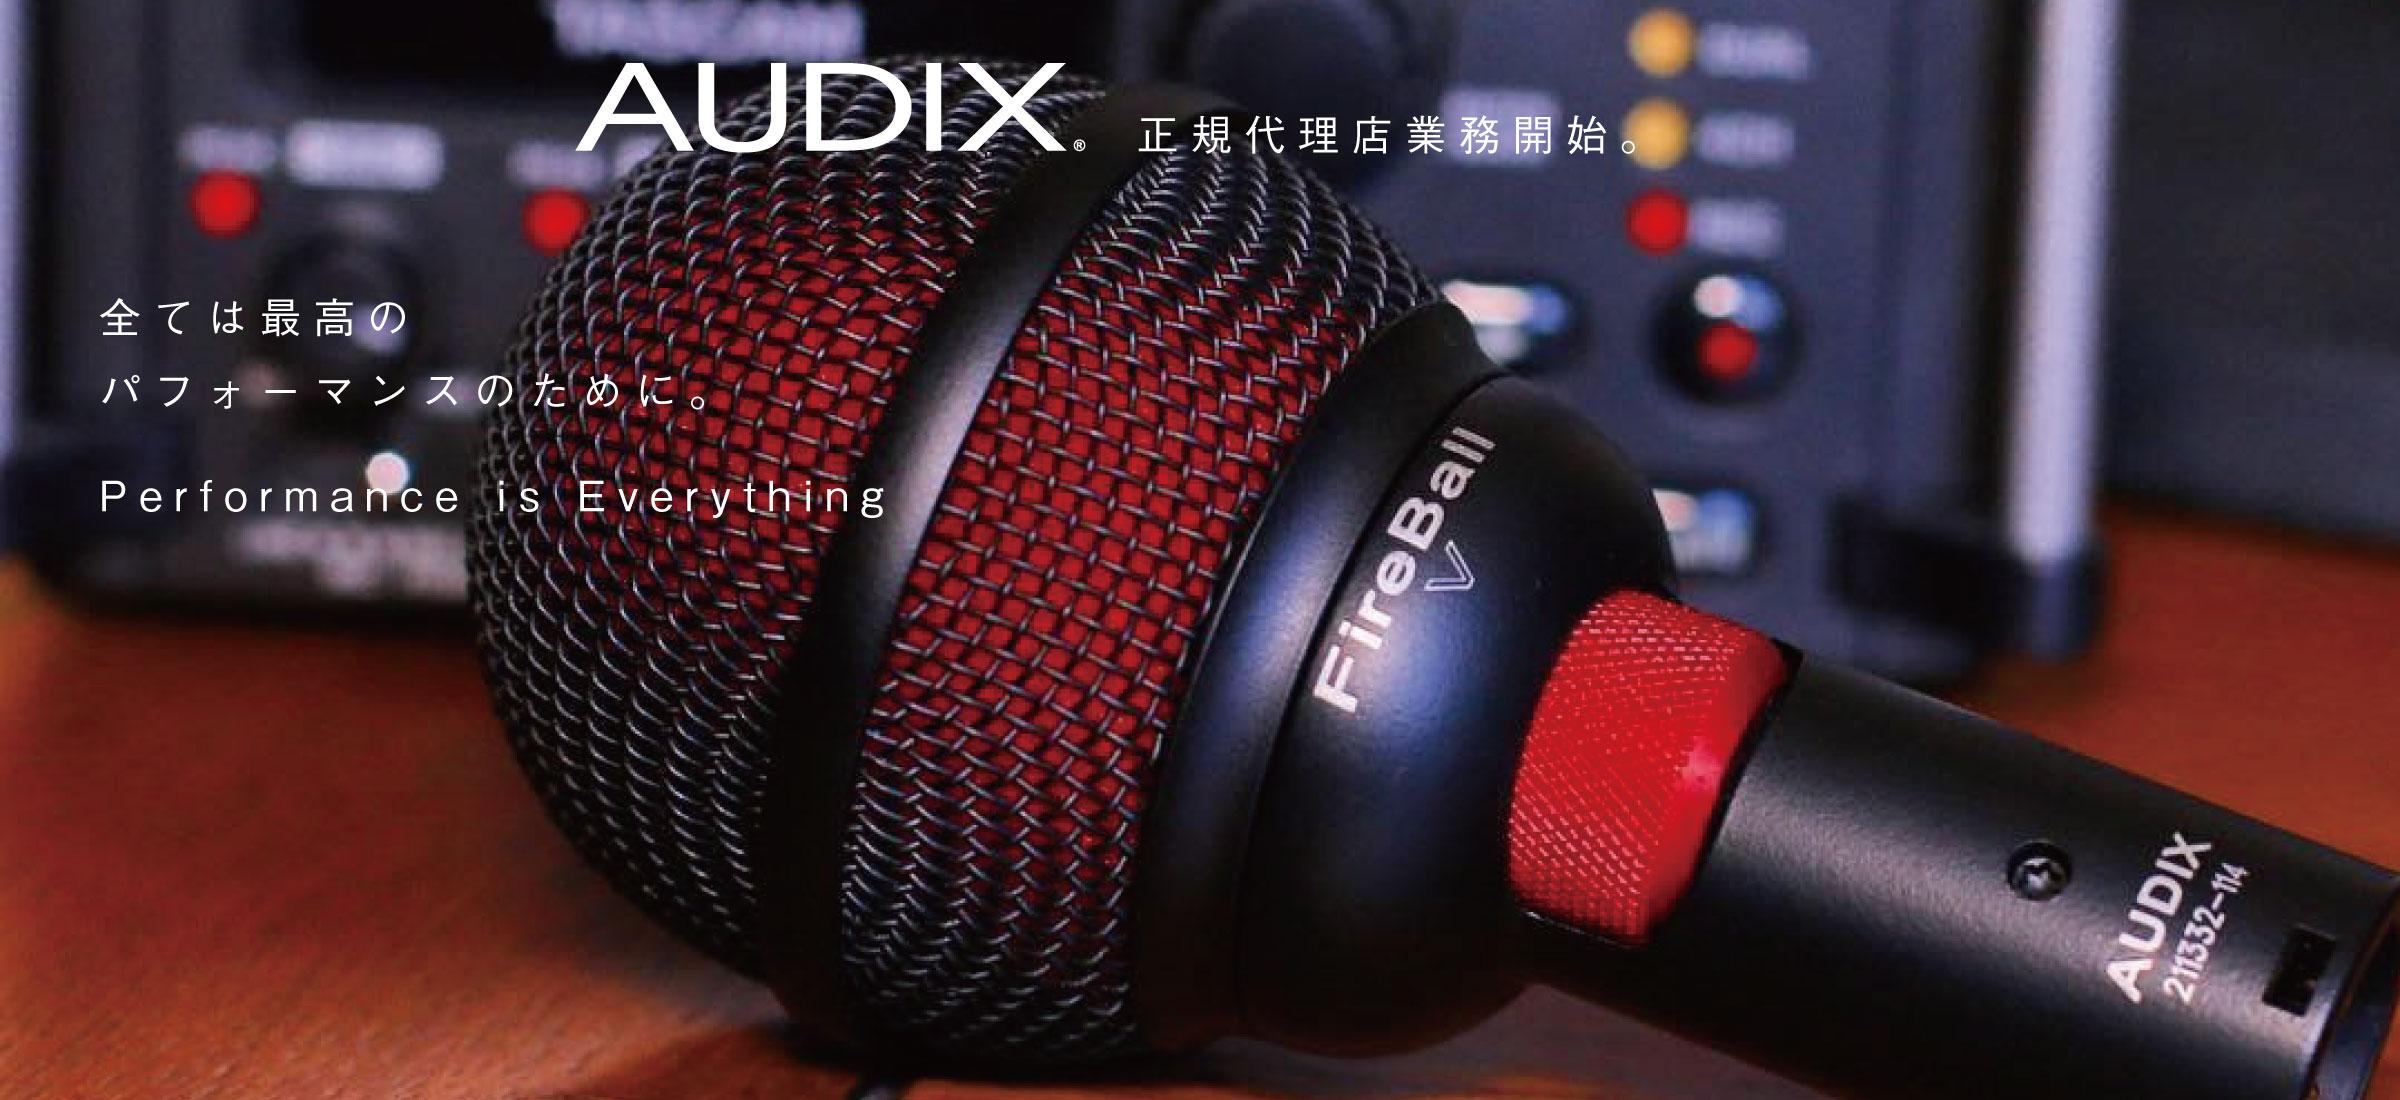 【AUDIX】AUDIX社製品正規代理店業務開始!